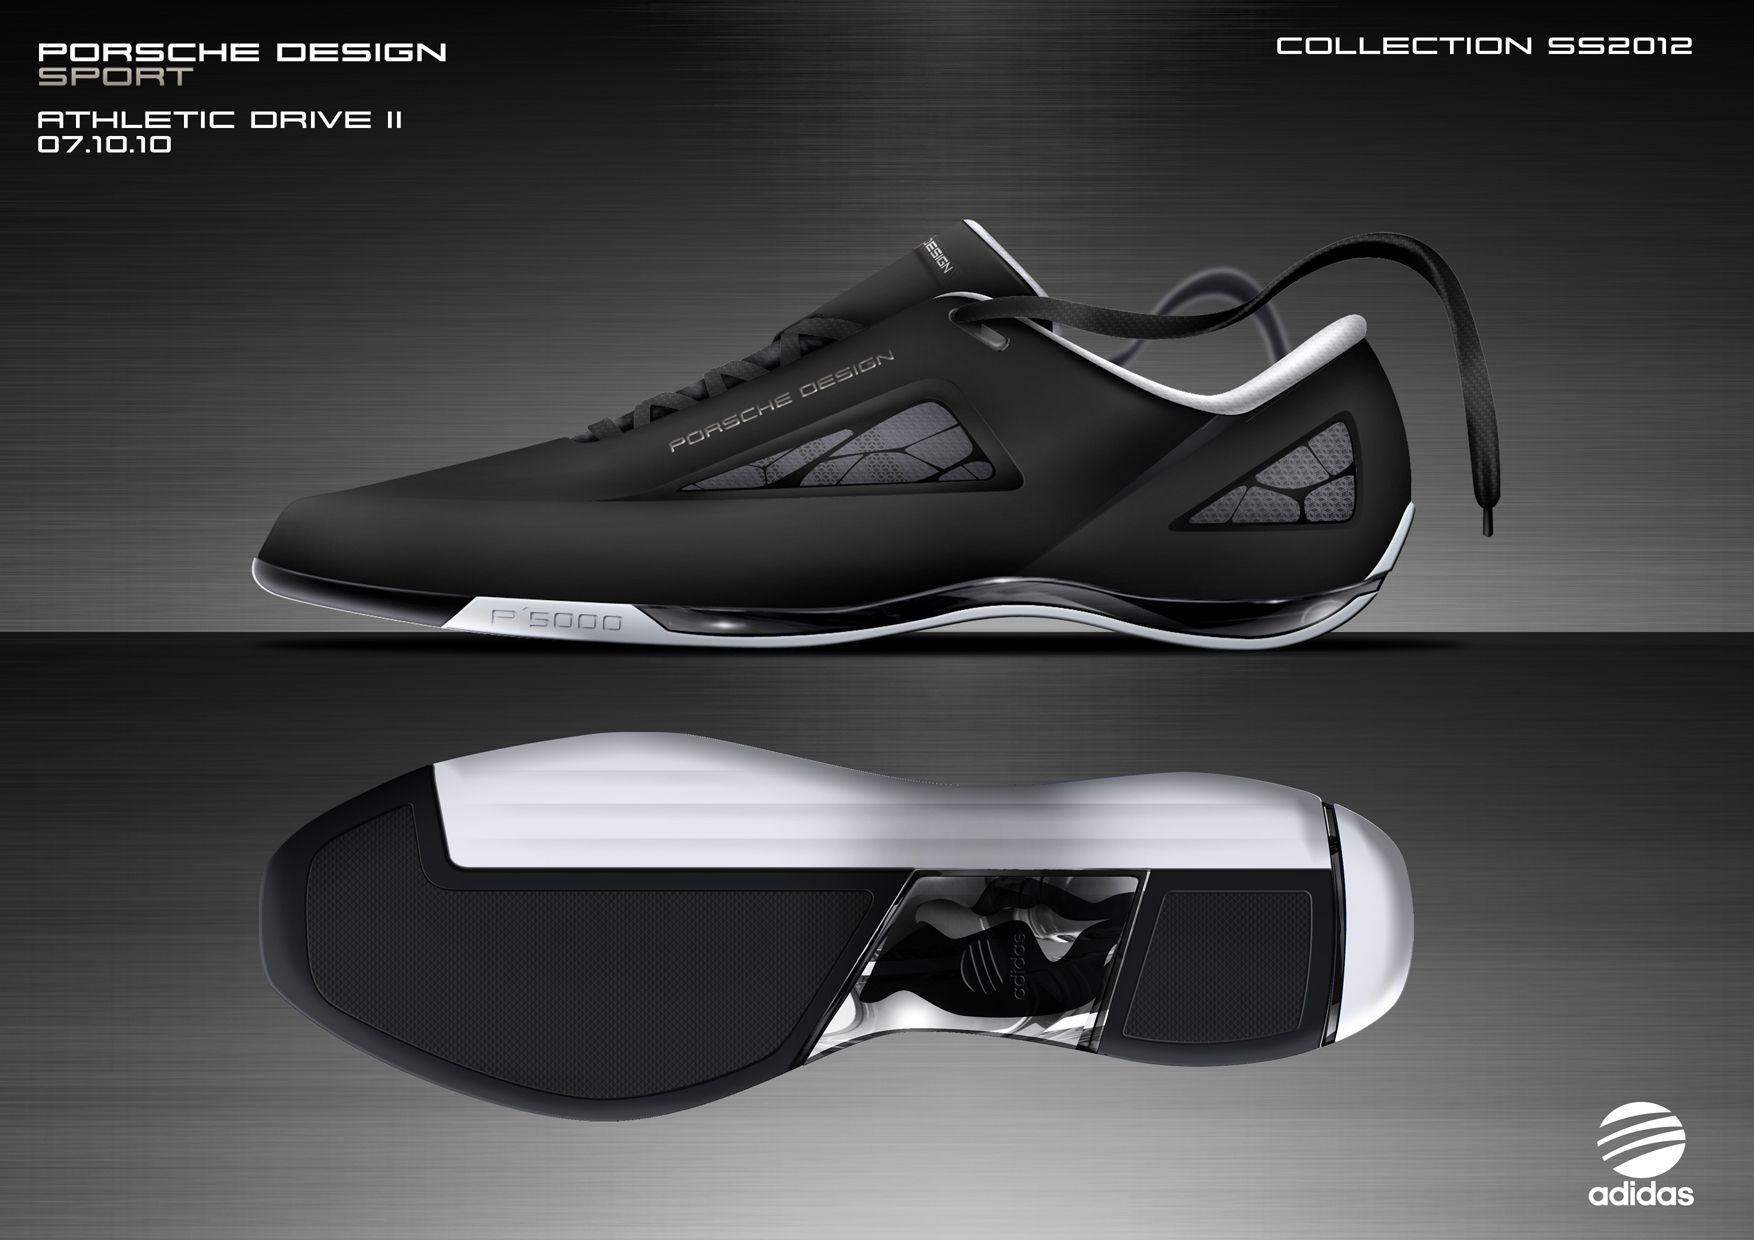 sports shoes c34cb 1e2bb Porsche Design Robert Quach Adidas ATHLETICDRIVEII